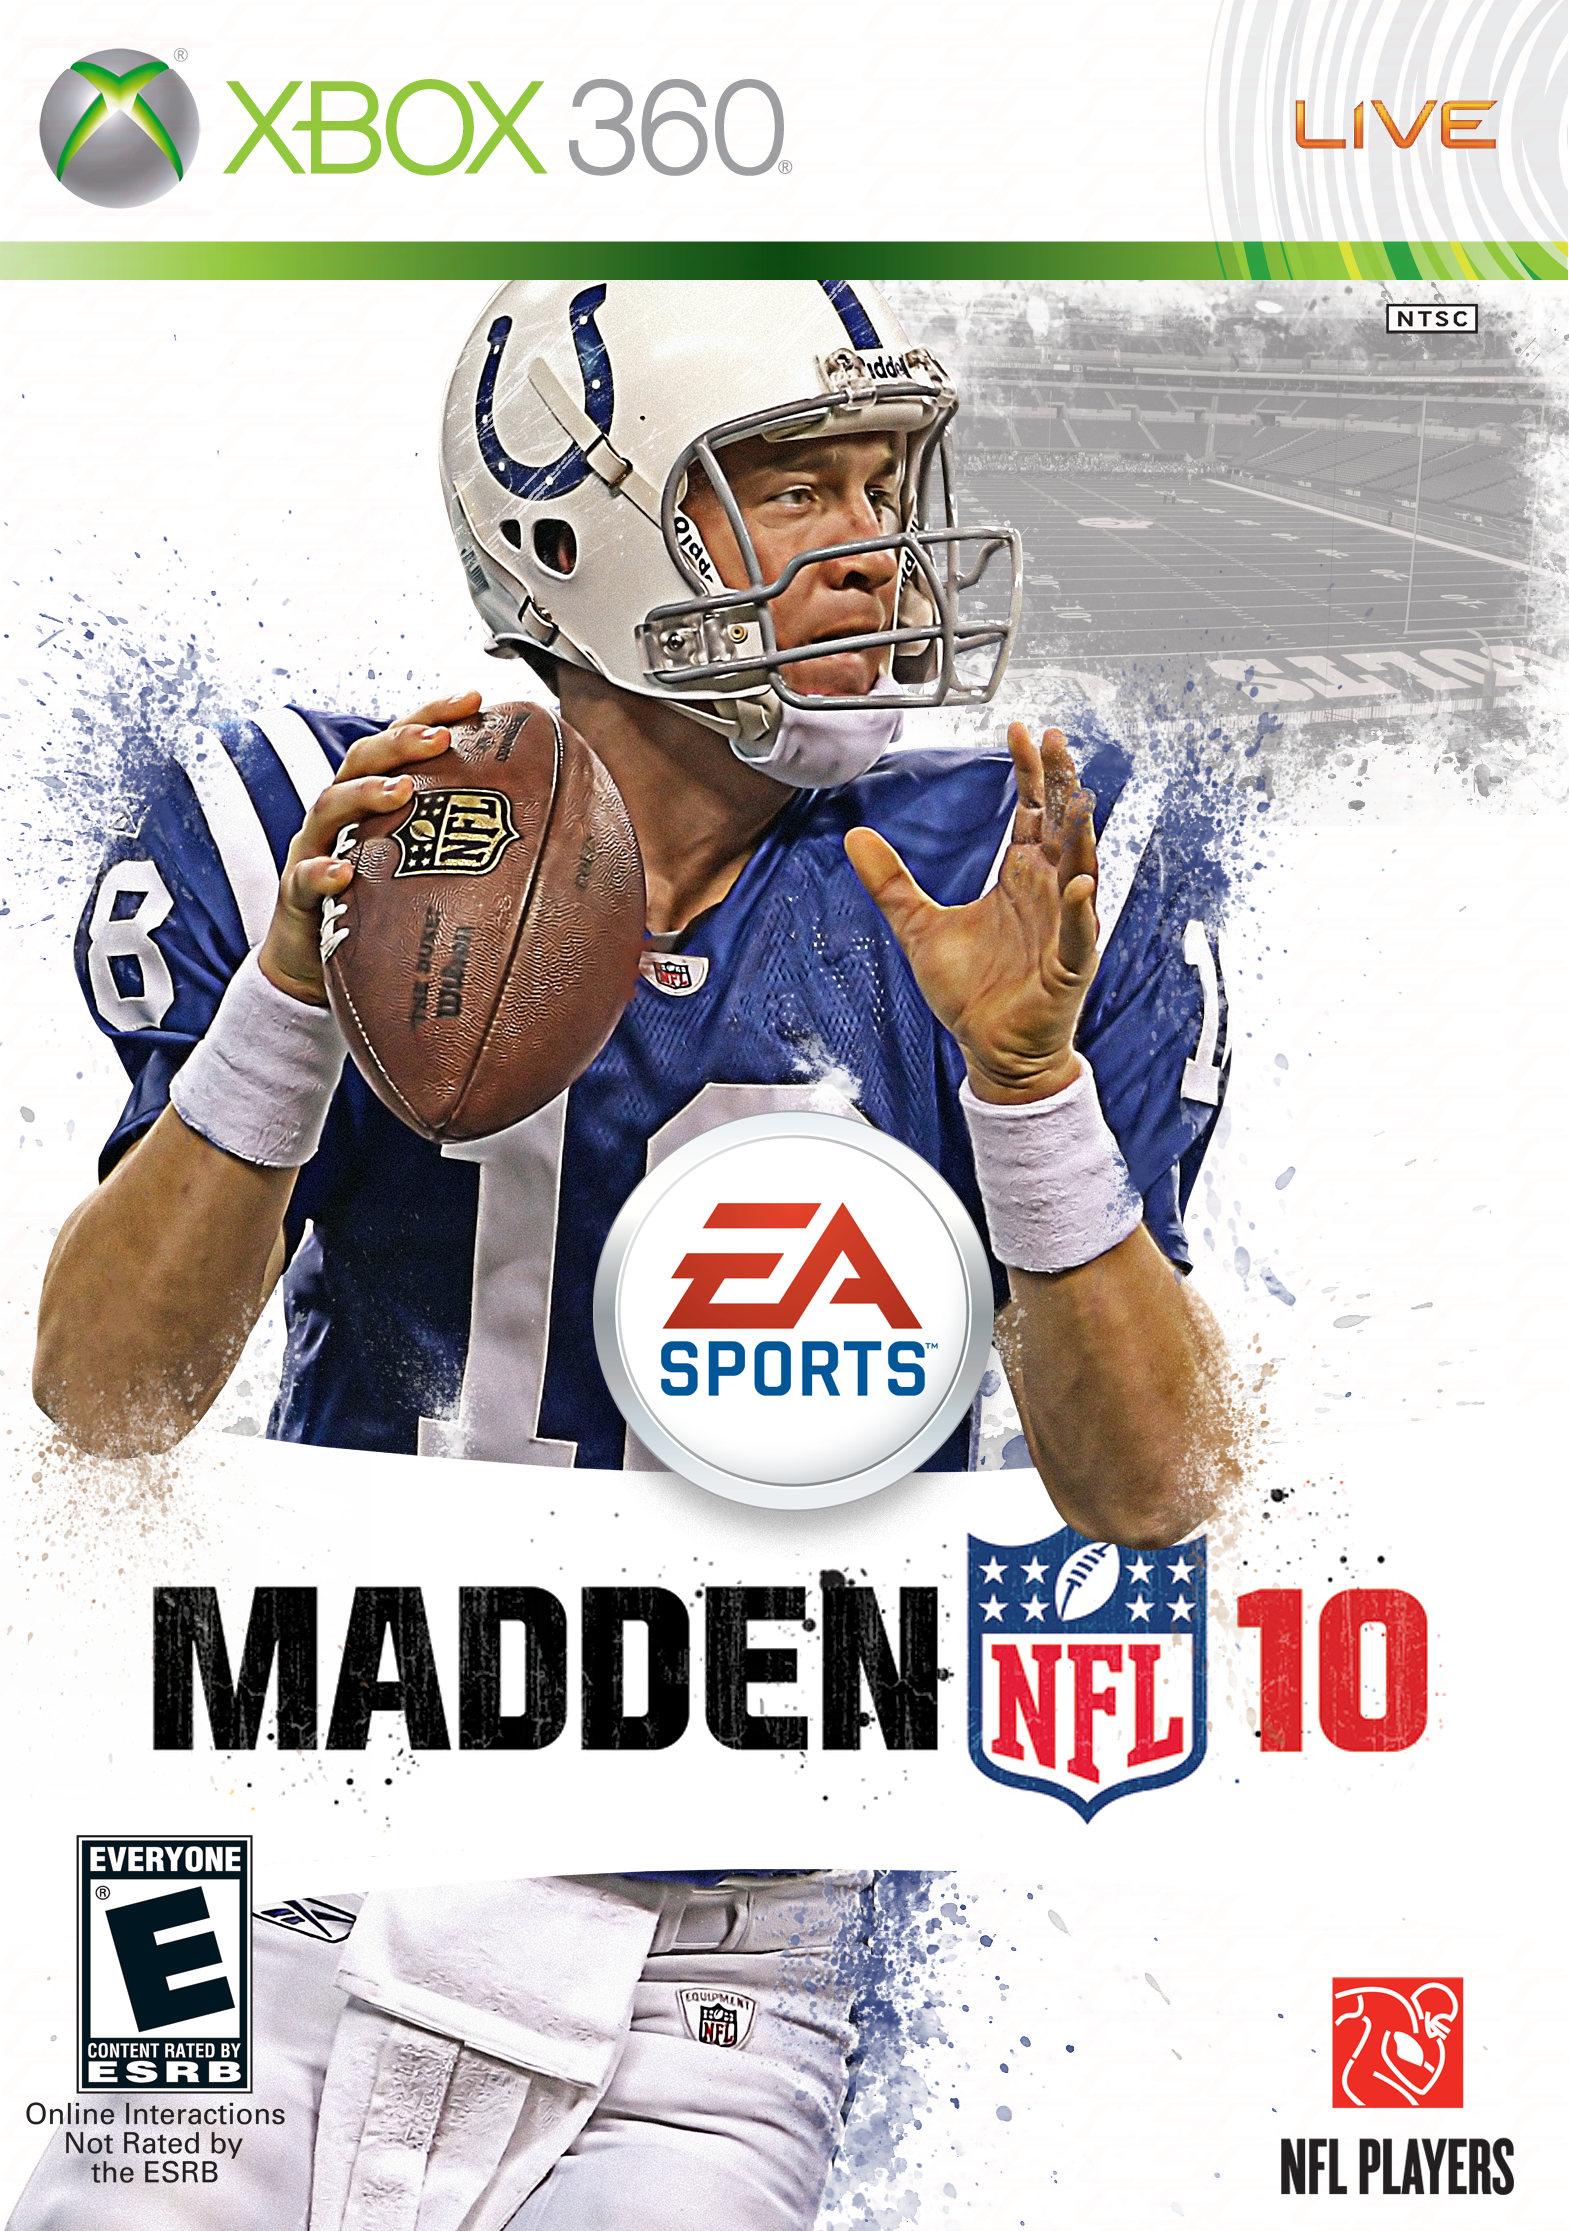 Madden Nfl 10 Peyton Manning Madden Nfl Madden Games Nfl